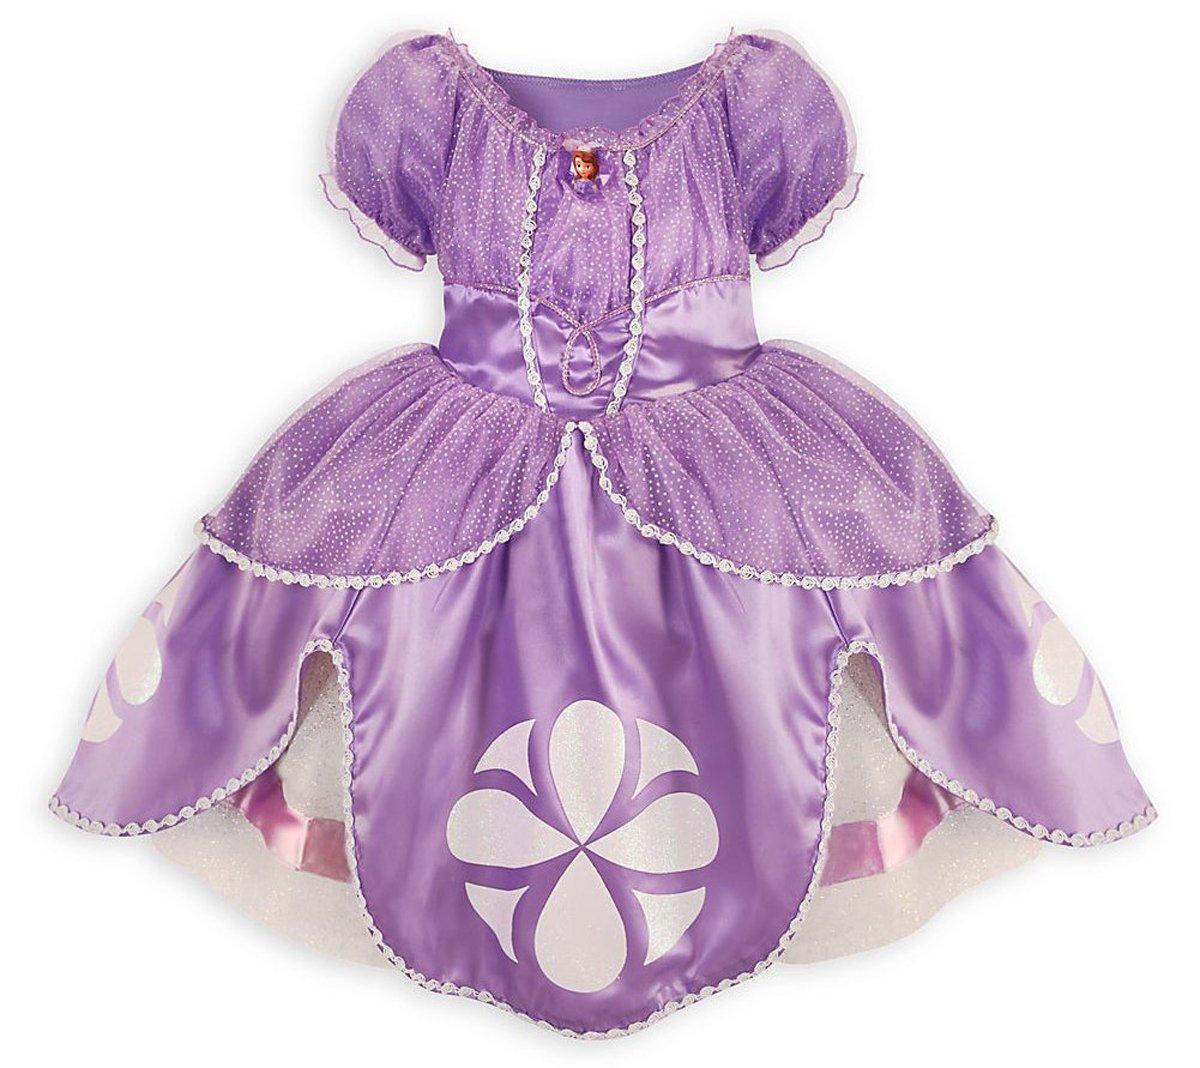 Amazon.com: Disney Sofia the First Dress Costume for Girls Small 5 ...